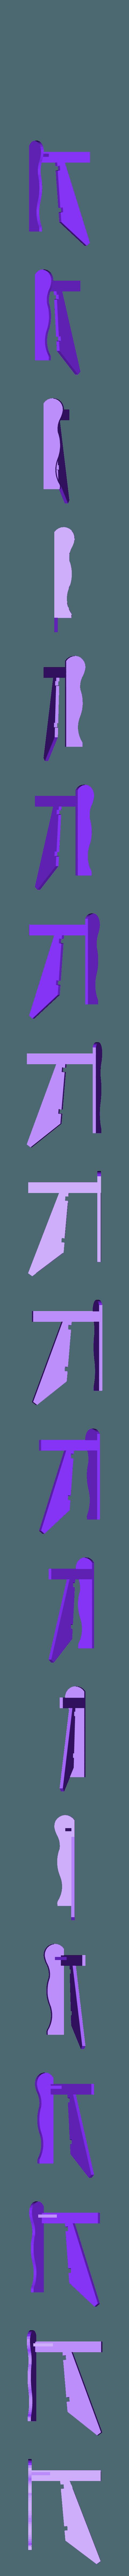 Right_Arm.stl Download free STL file Adirondack Chair • 3D printing design, Lurgmog